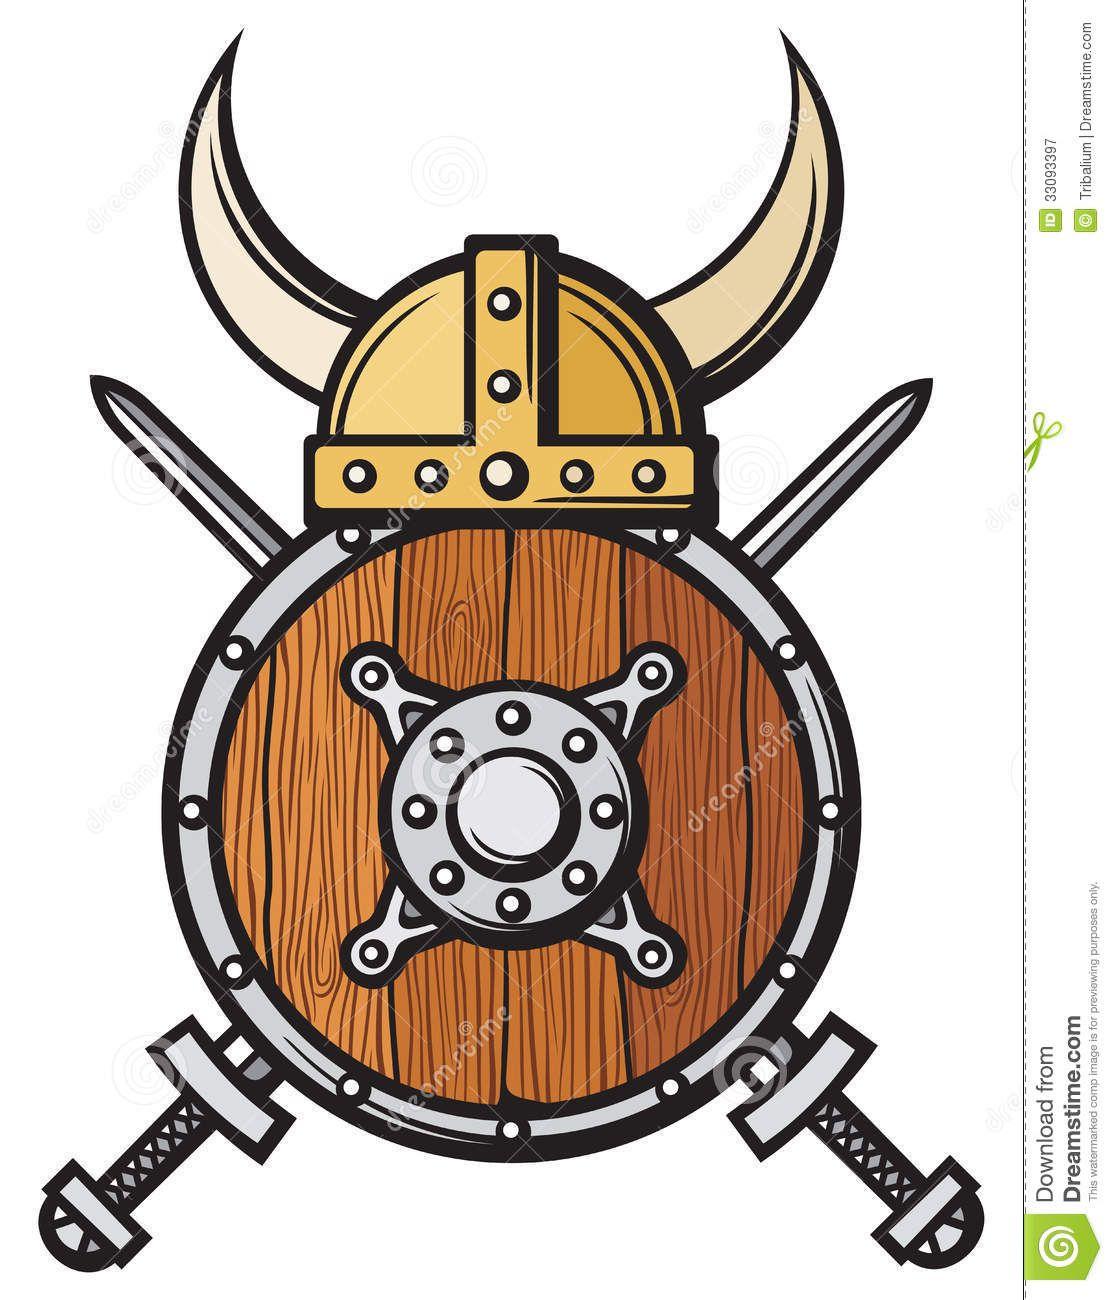 viking helmet royalty free stock photography image 33093397 [ 1113 x 1300 Pixel ]